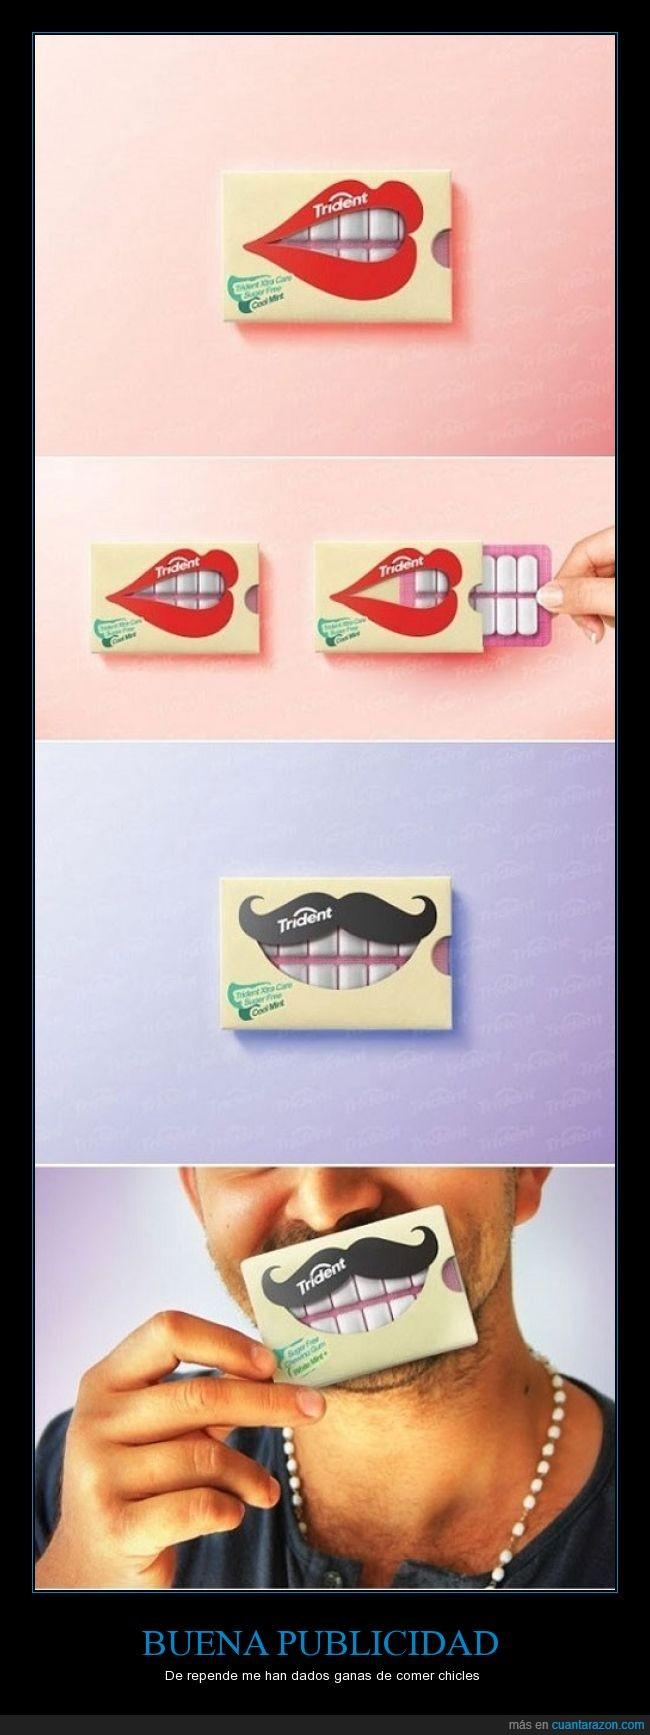 boca,cajas,chicles,cool,dientes,quierouno,soloporlacaja,sonrisas,trident